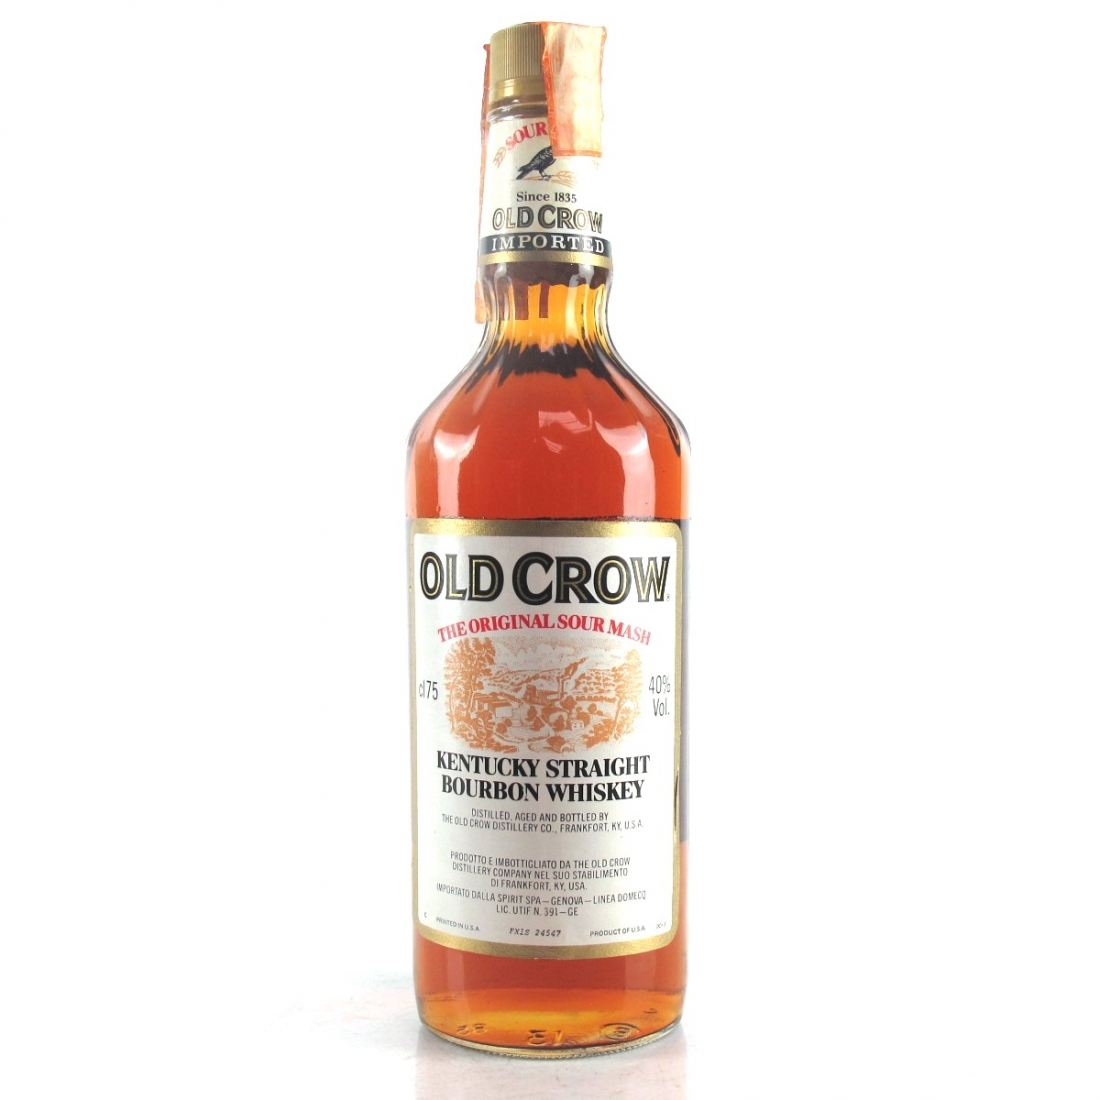 Old Crow Kentucky Straight Bourbon 1980s